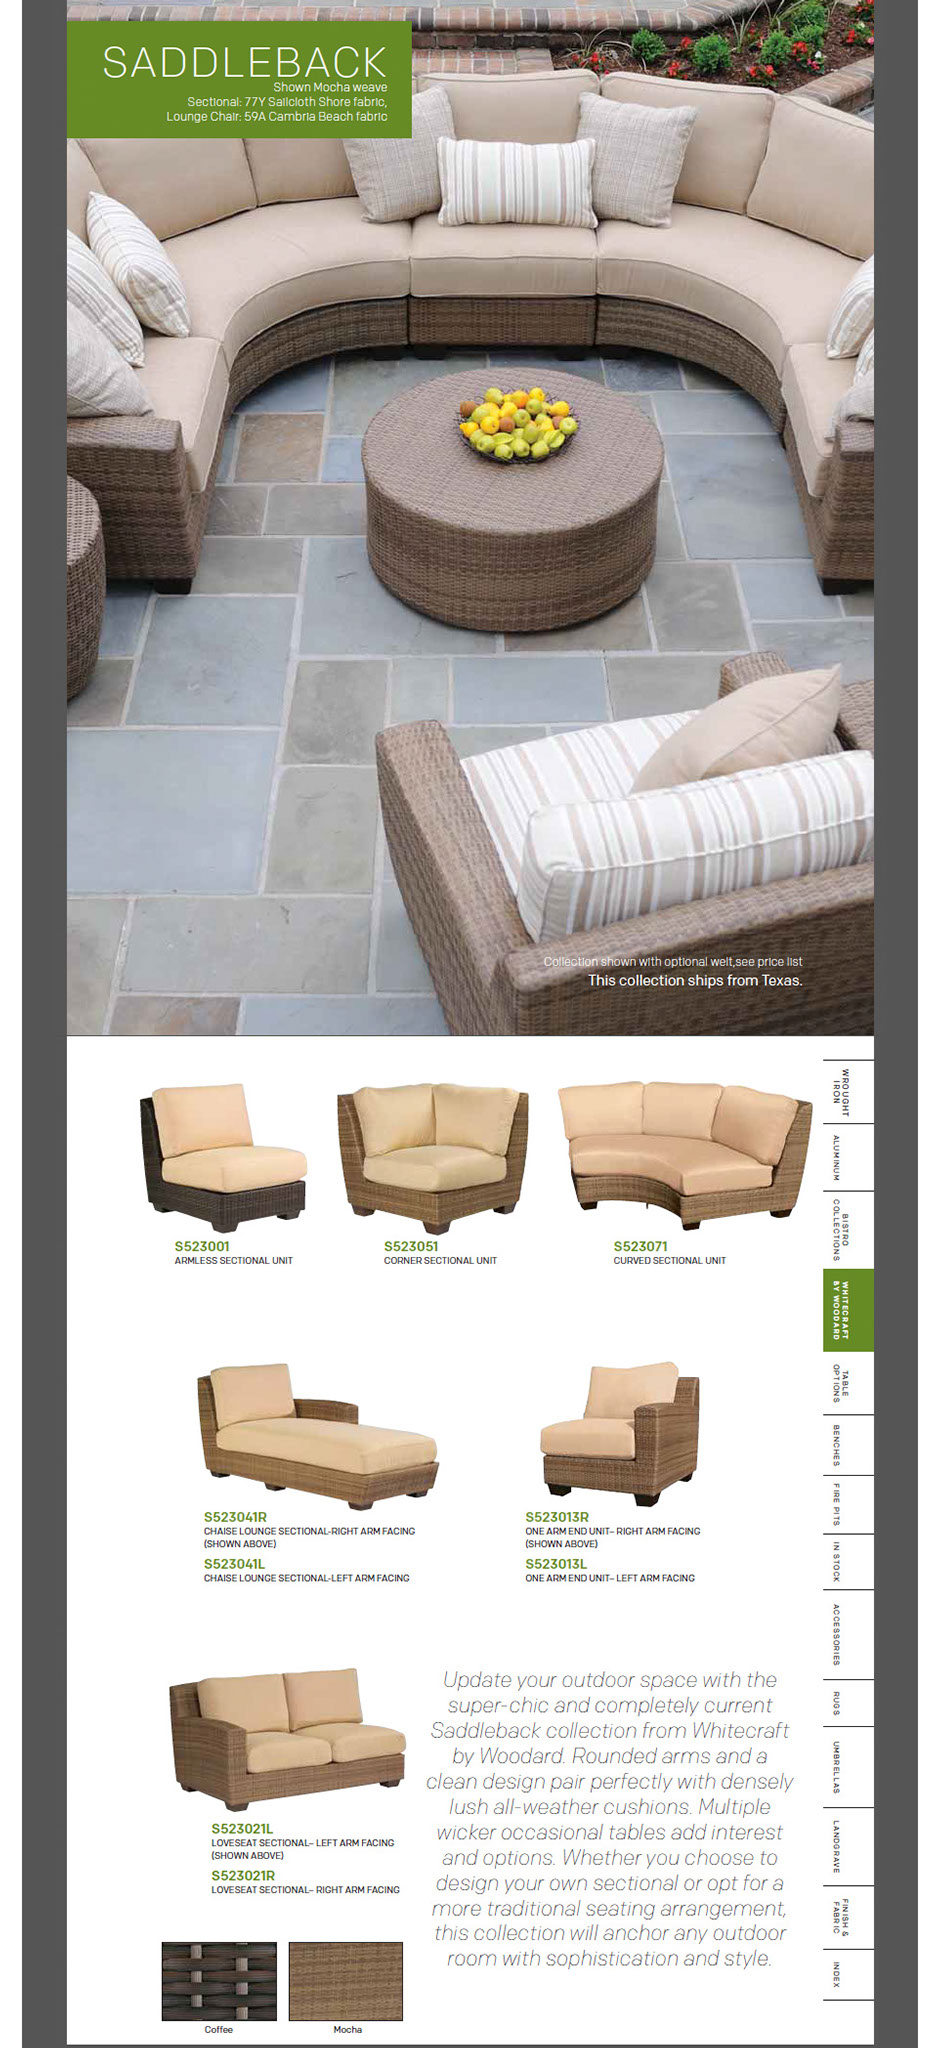 Saddleback Outdoor Furniture